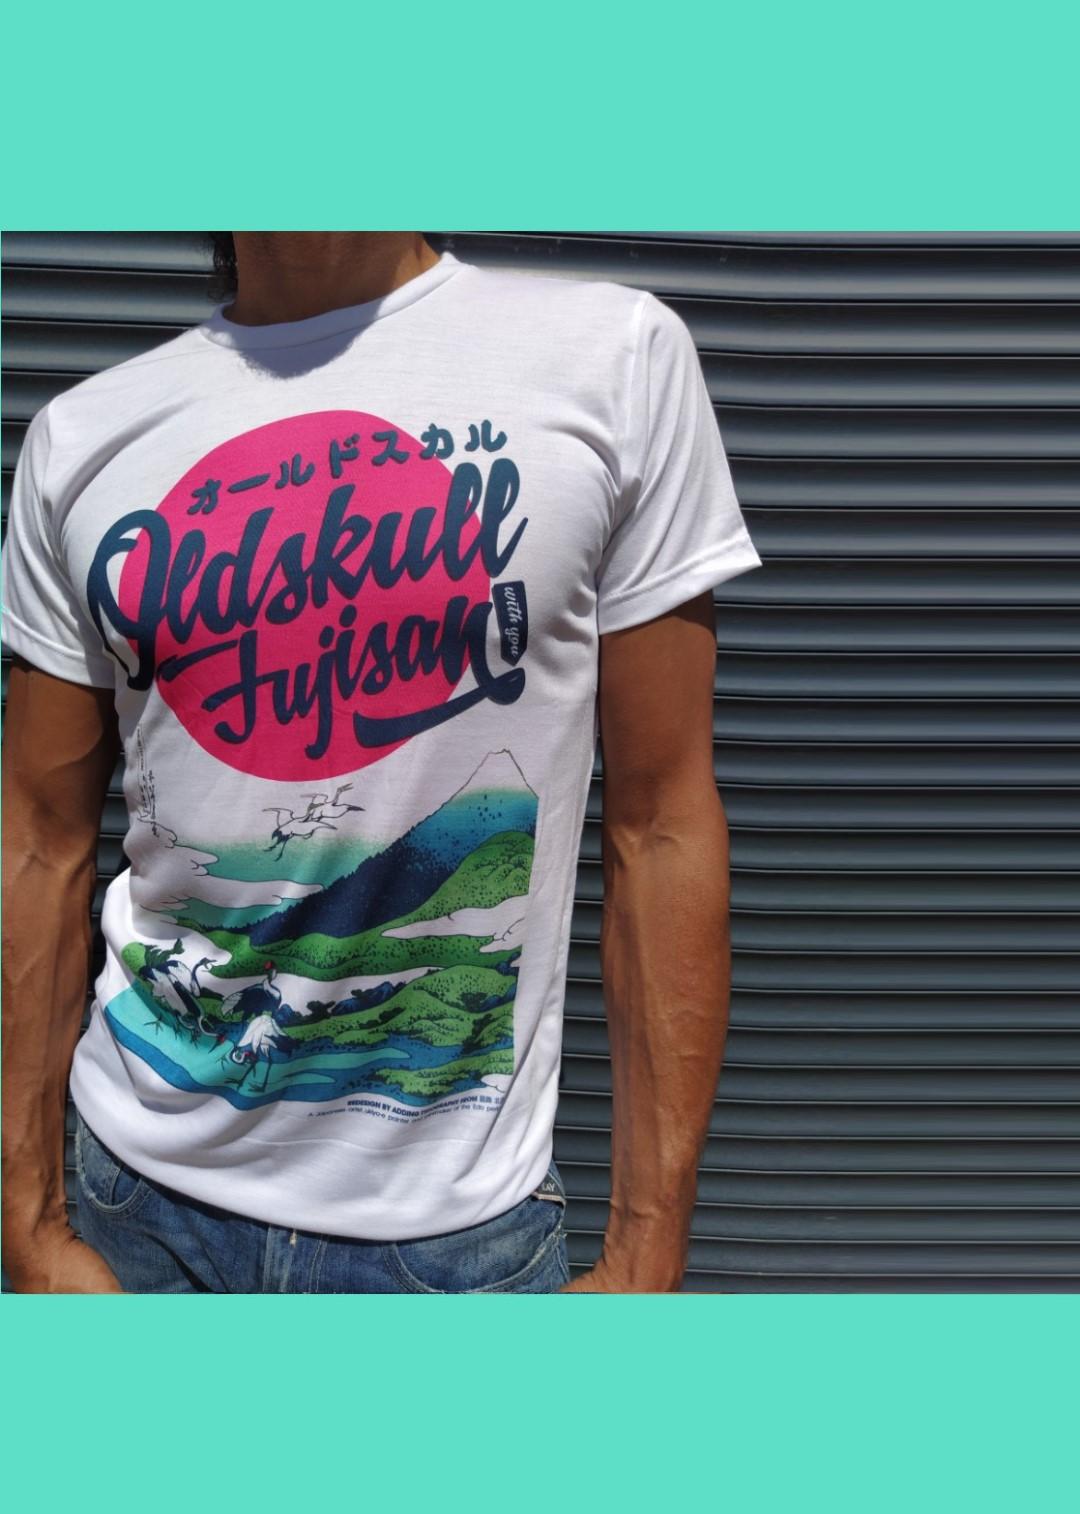 Tee shirt blanc Oldskull Fujisan.